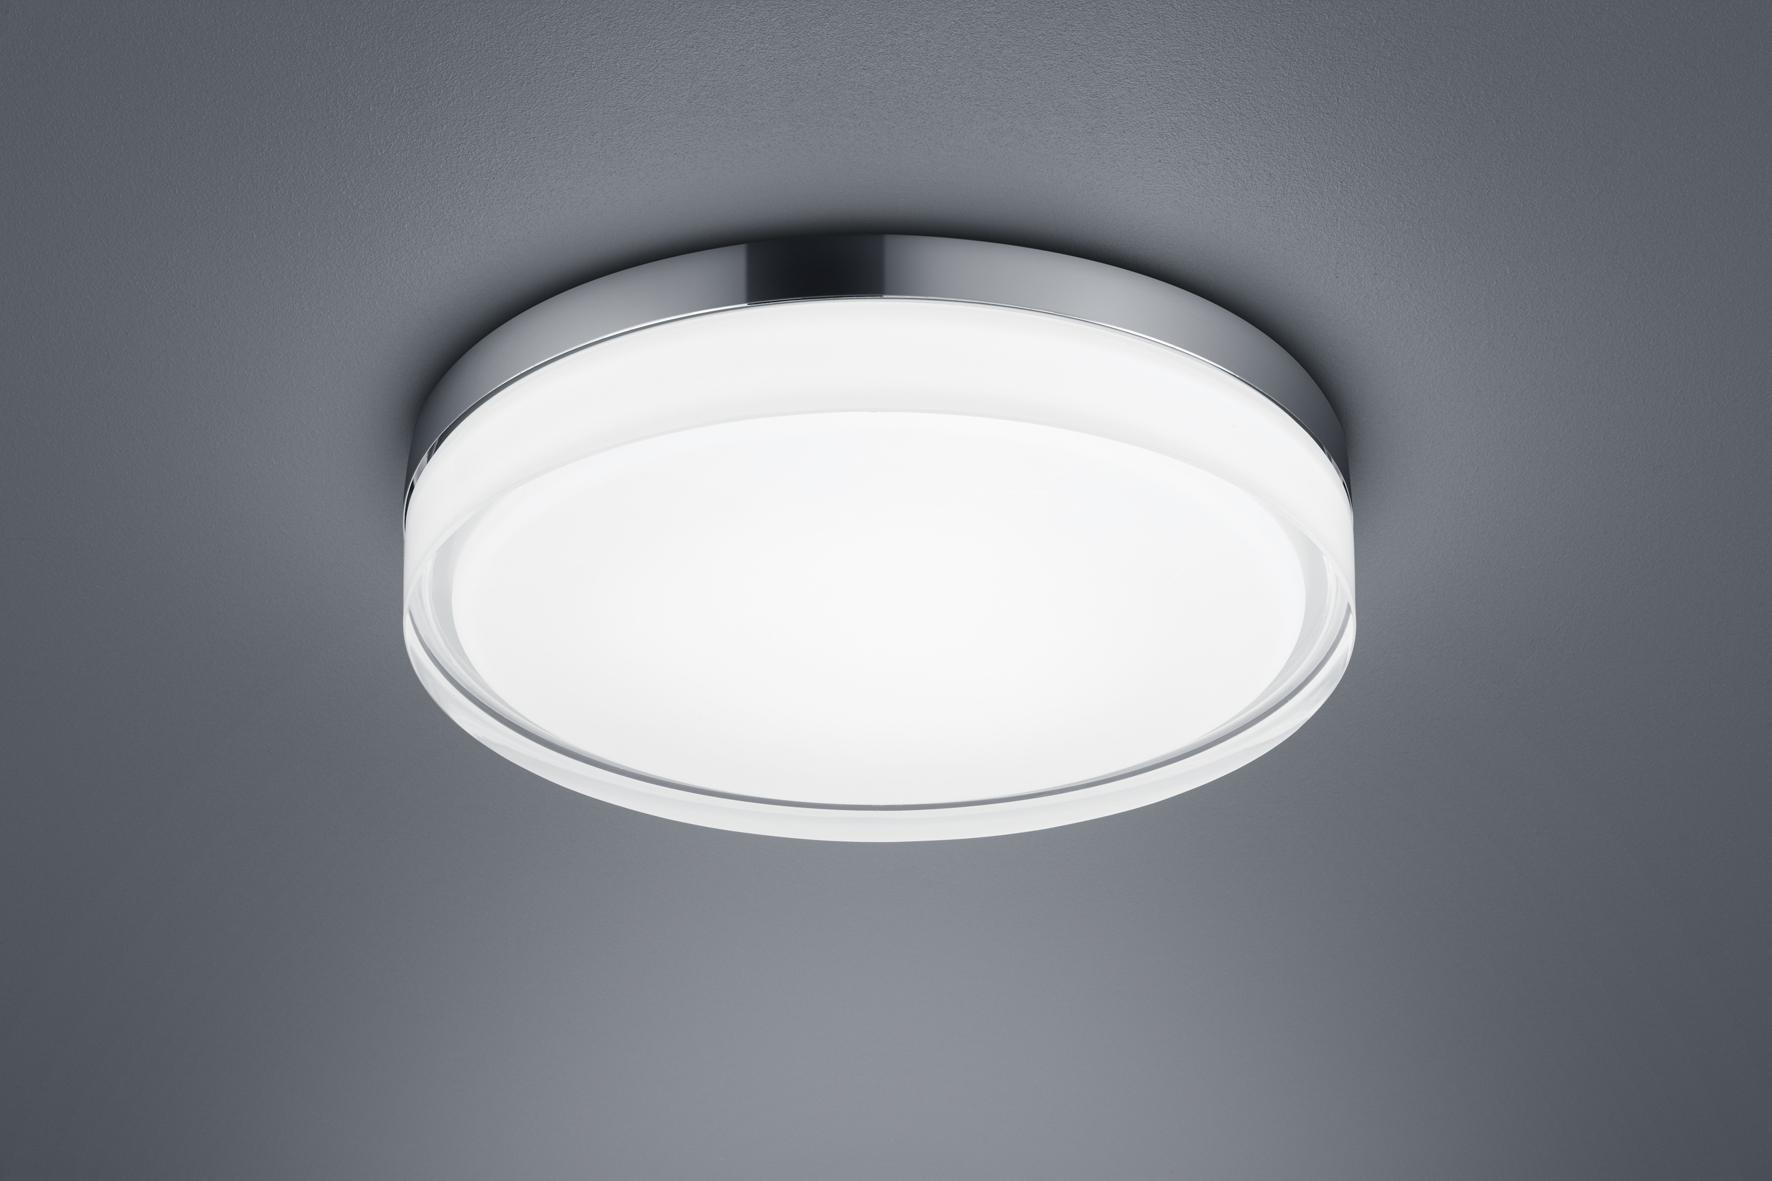 Helestra 20/20.20 LED Deckenleuchte TANA chrom Glas teilsatiniert Ø 20 cm